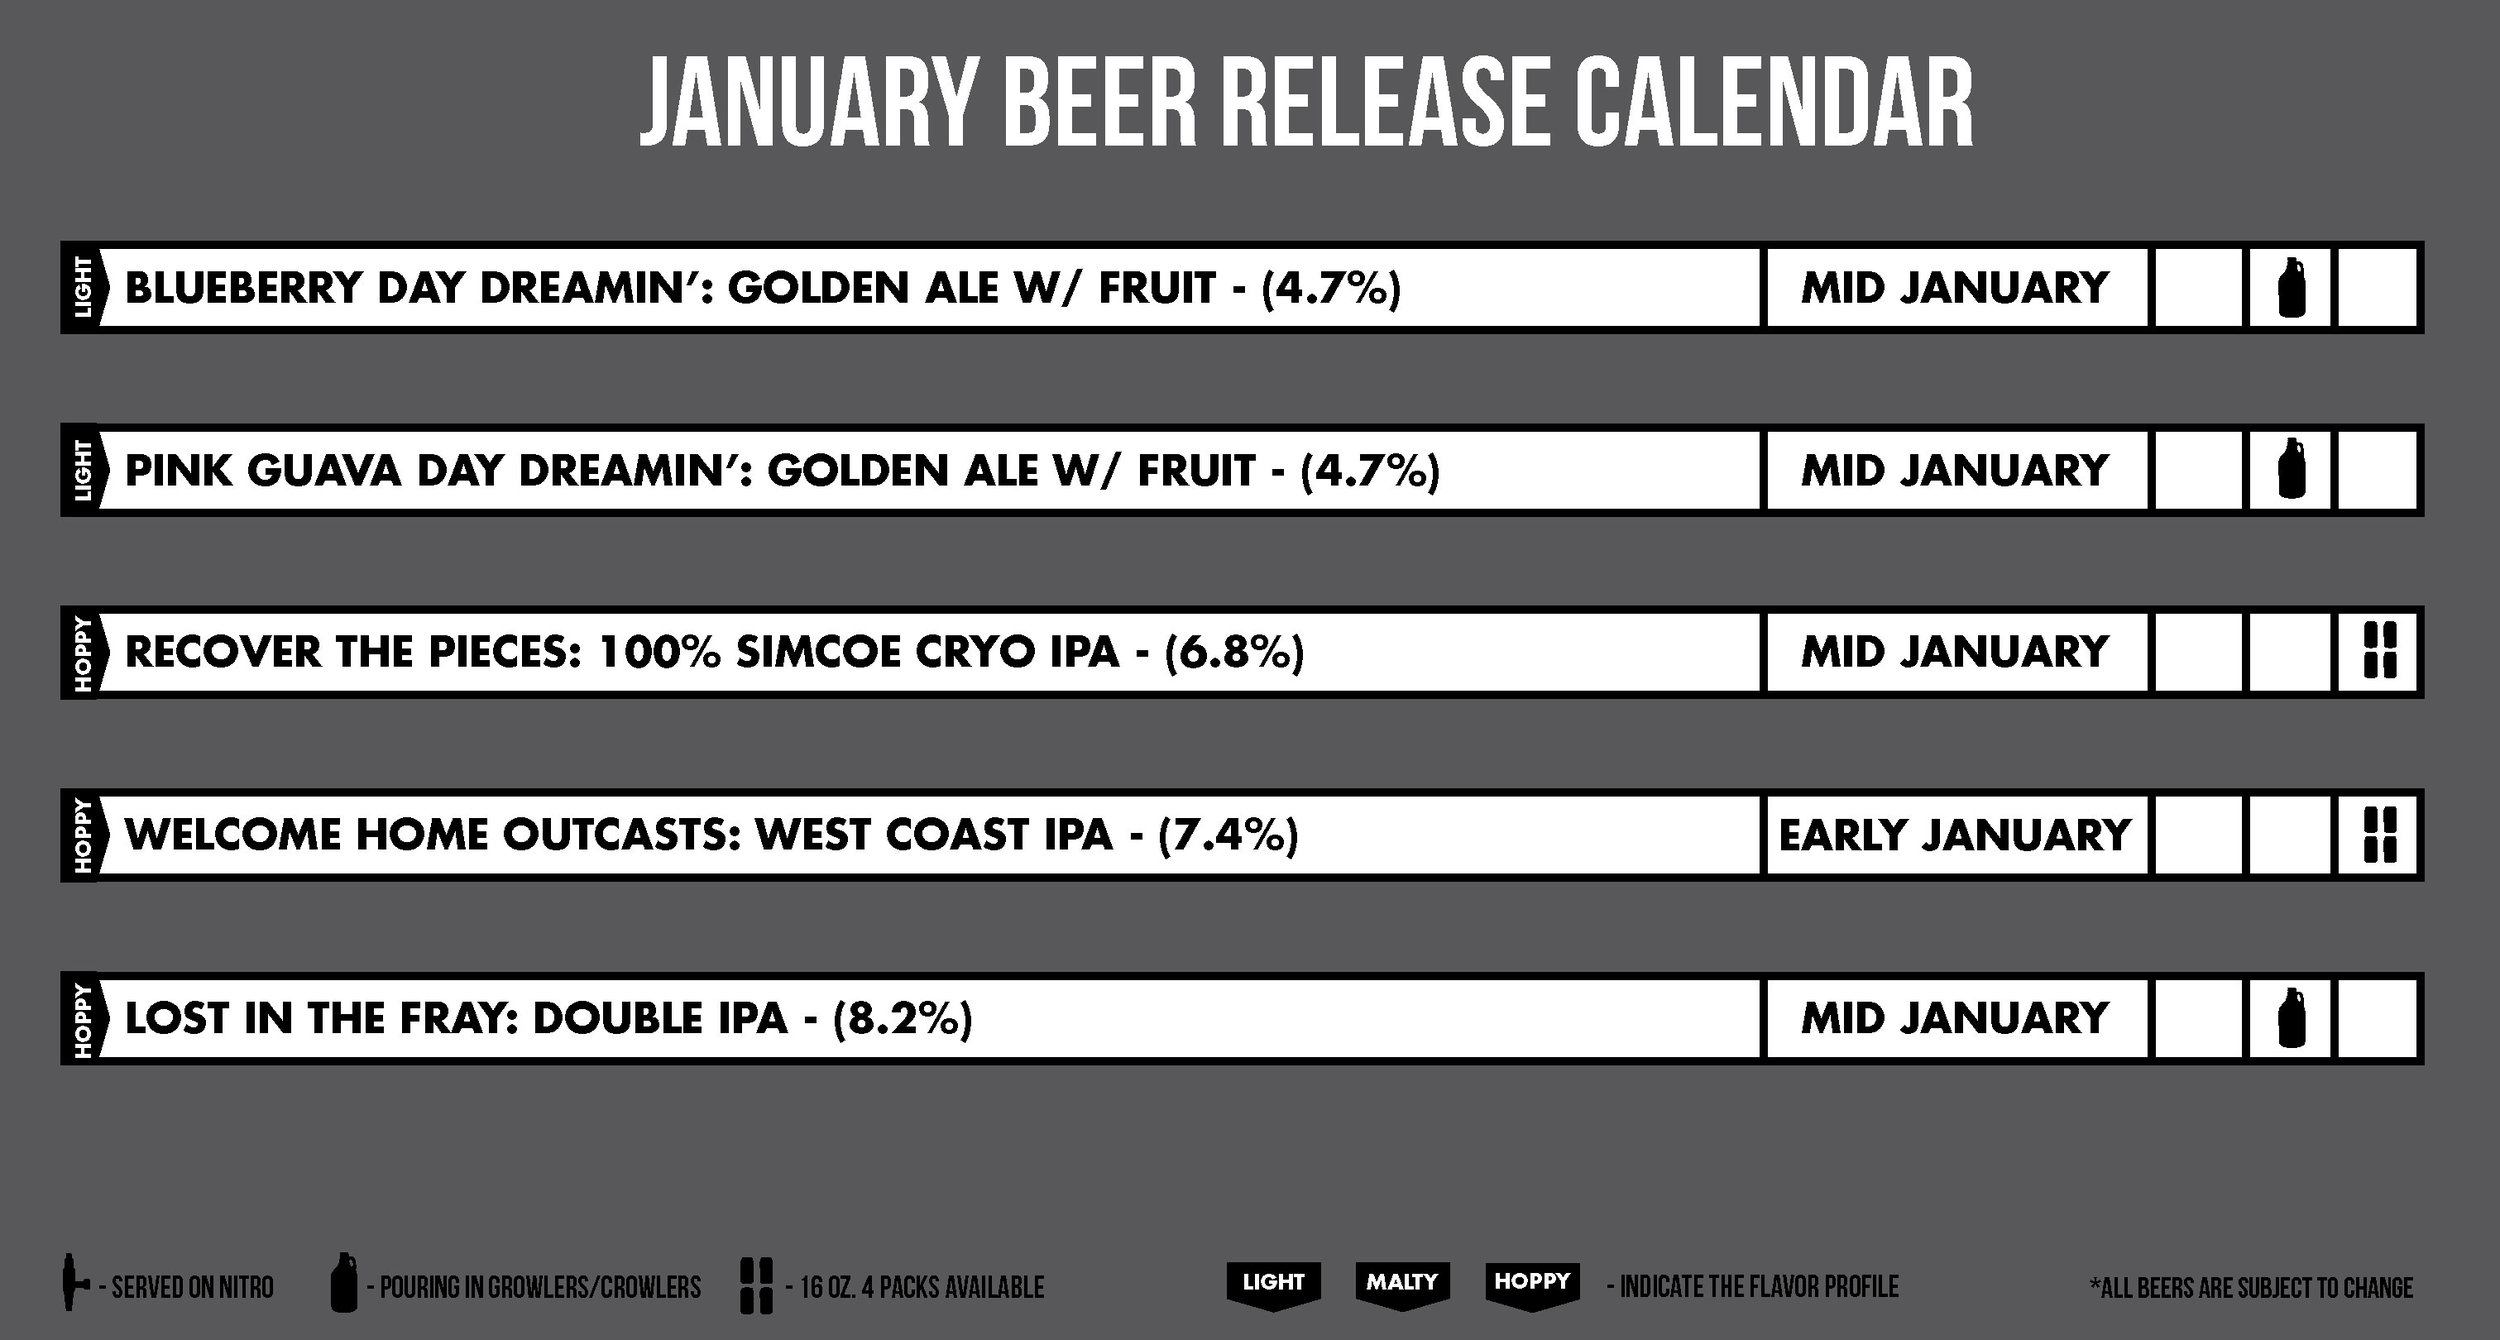 January_2018_Beer_Release_Calendar.jpg